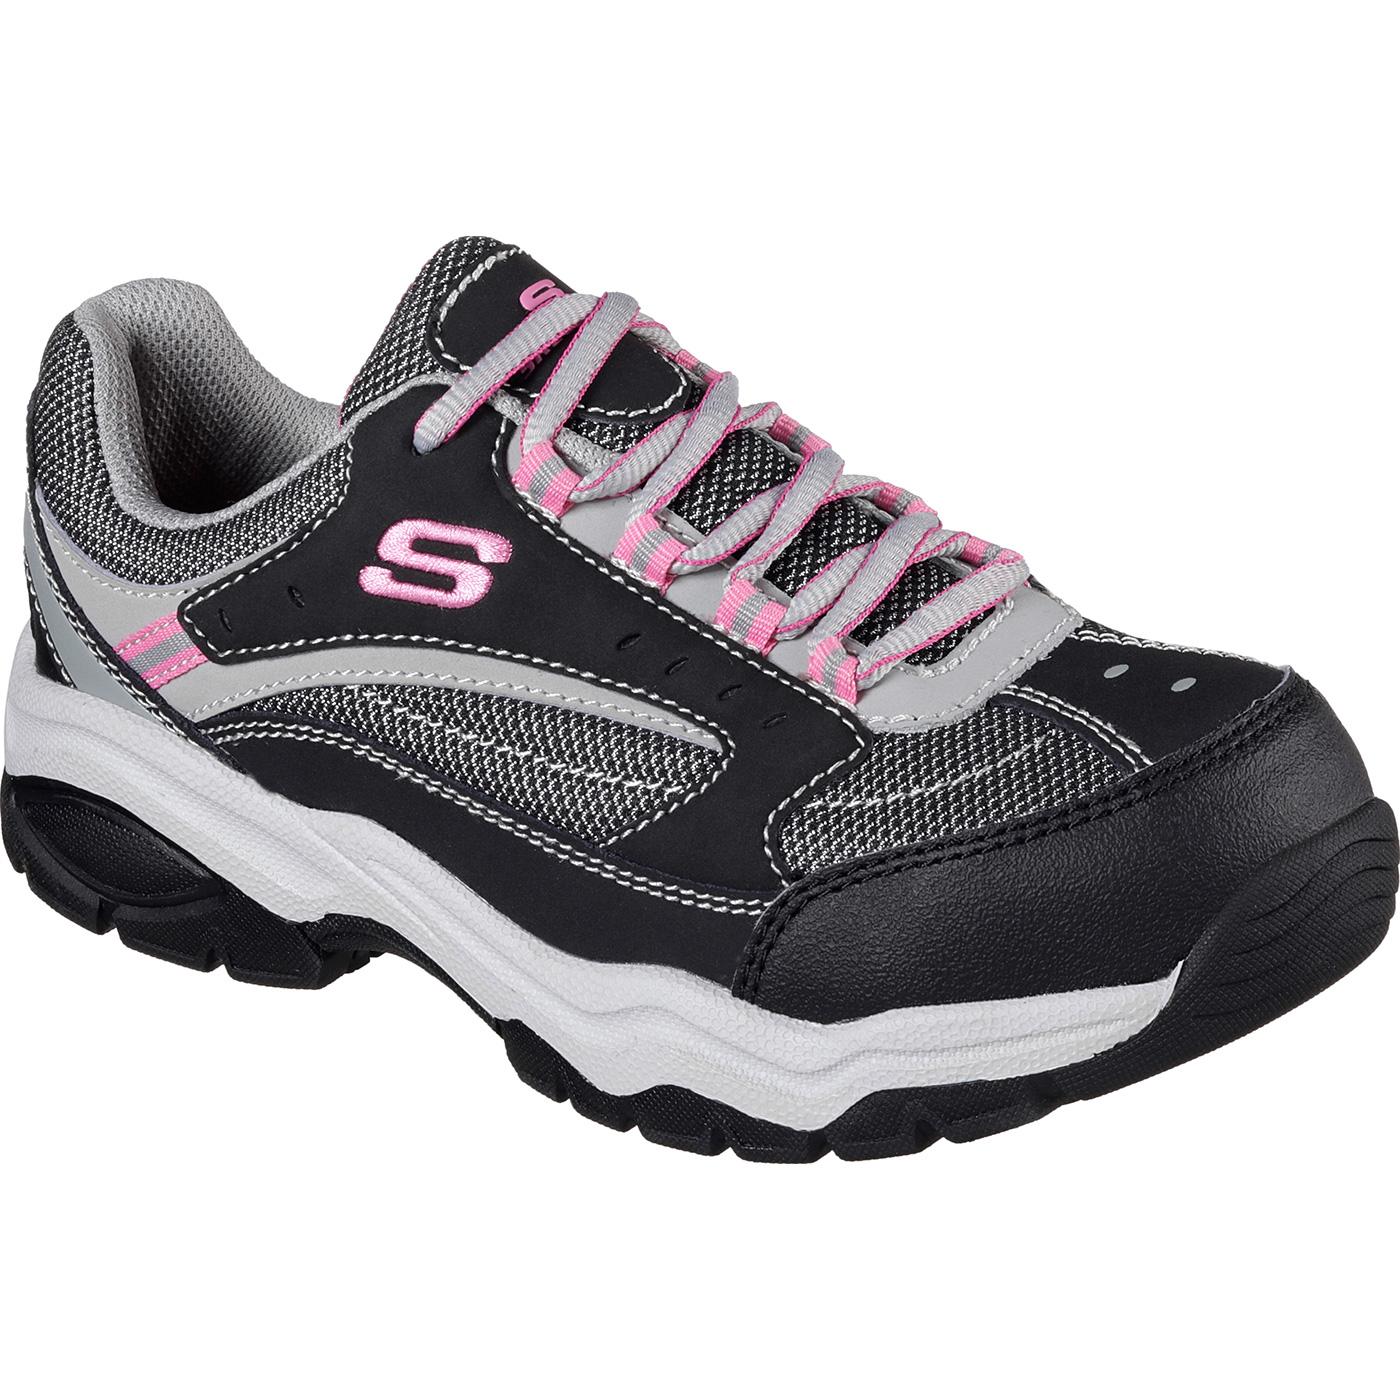 SKECHERS Work Biscoe Women s Steel Toe Electrical Hazard Slip-Resistant  Athletic ShoeSKECHERS Work Biscoe Women s Steel Toe Electrical Hazard Slip- Resistant ... 421d4c56e